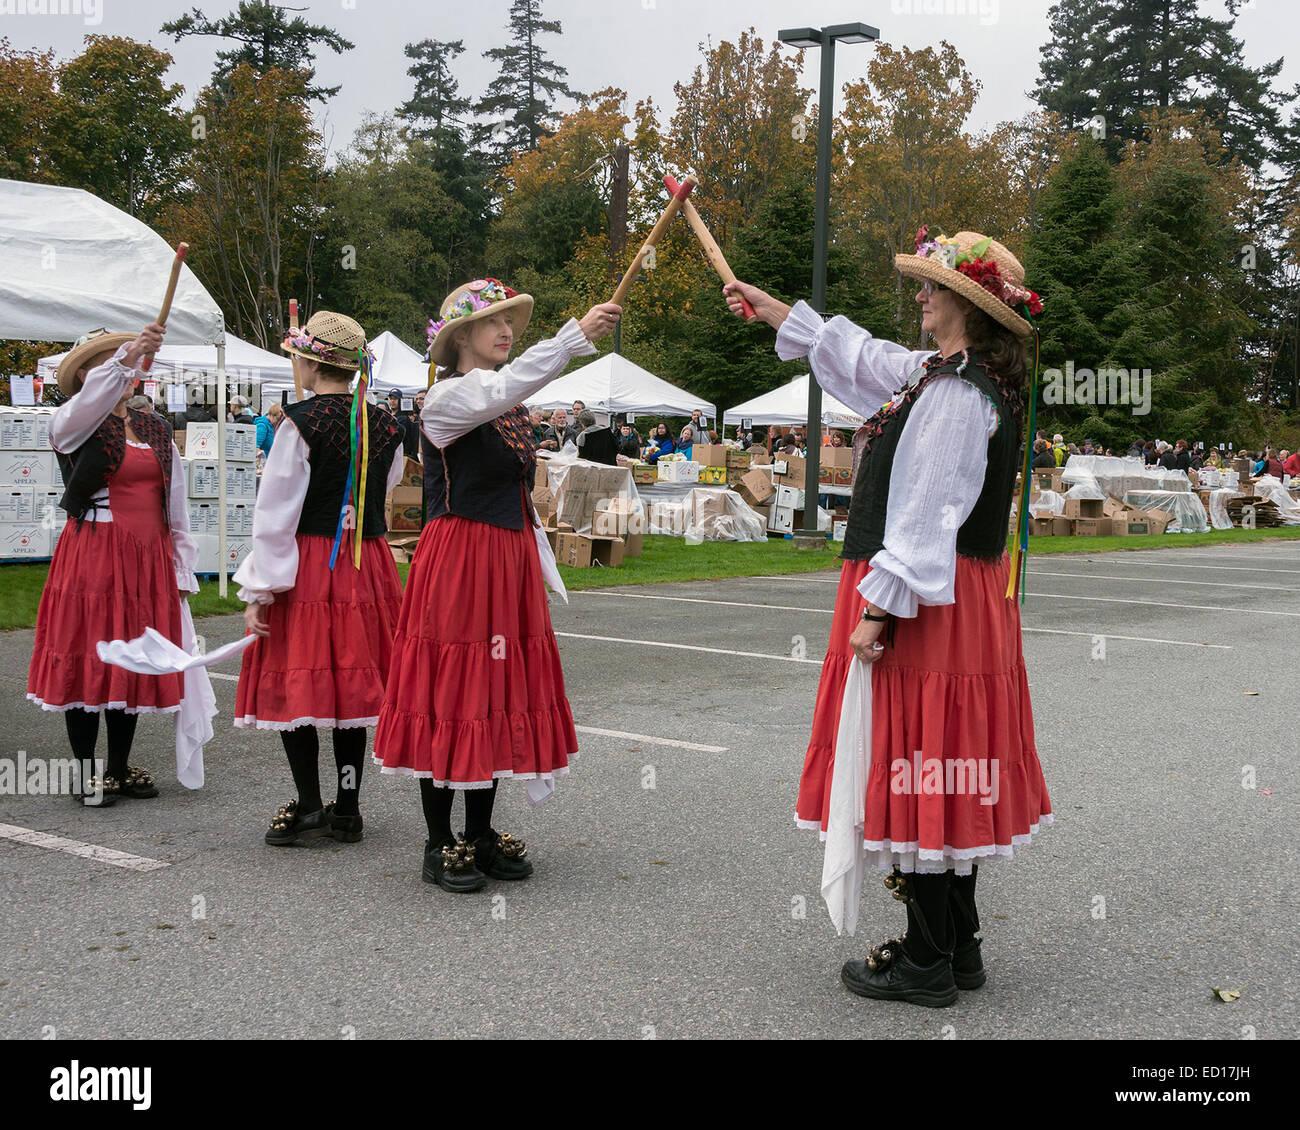 Morris dancers #14, Vancouver, British Columbia, Canada - Stock Image